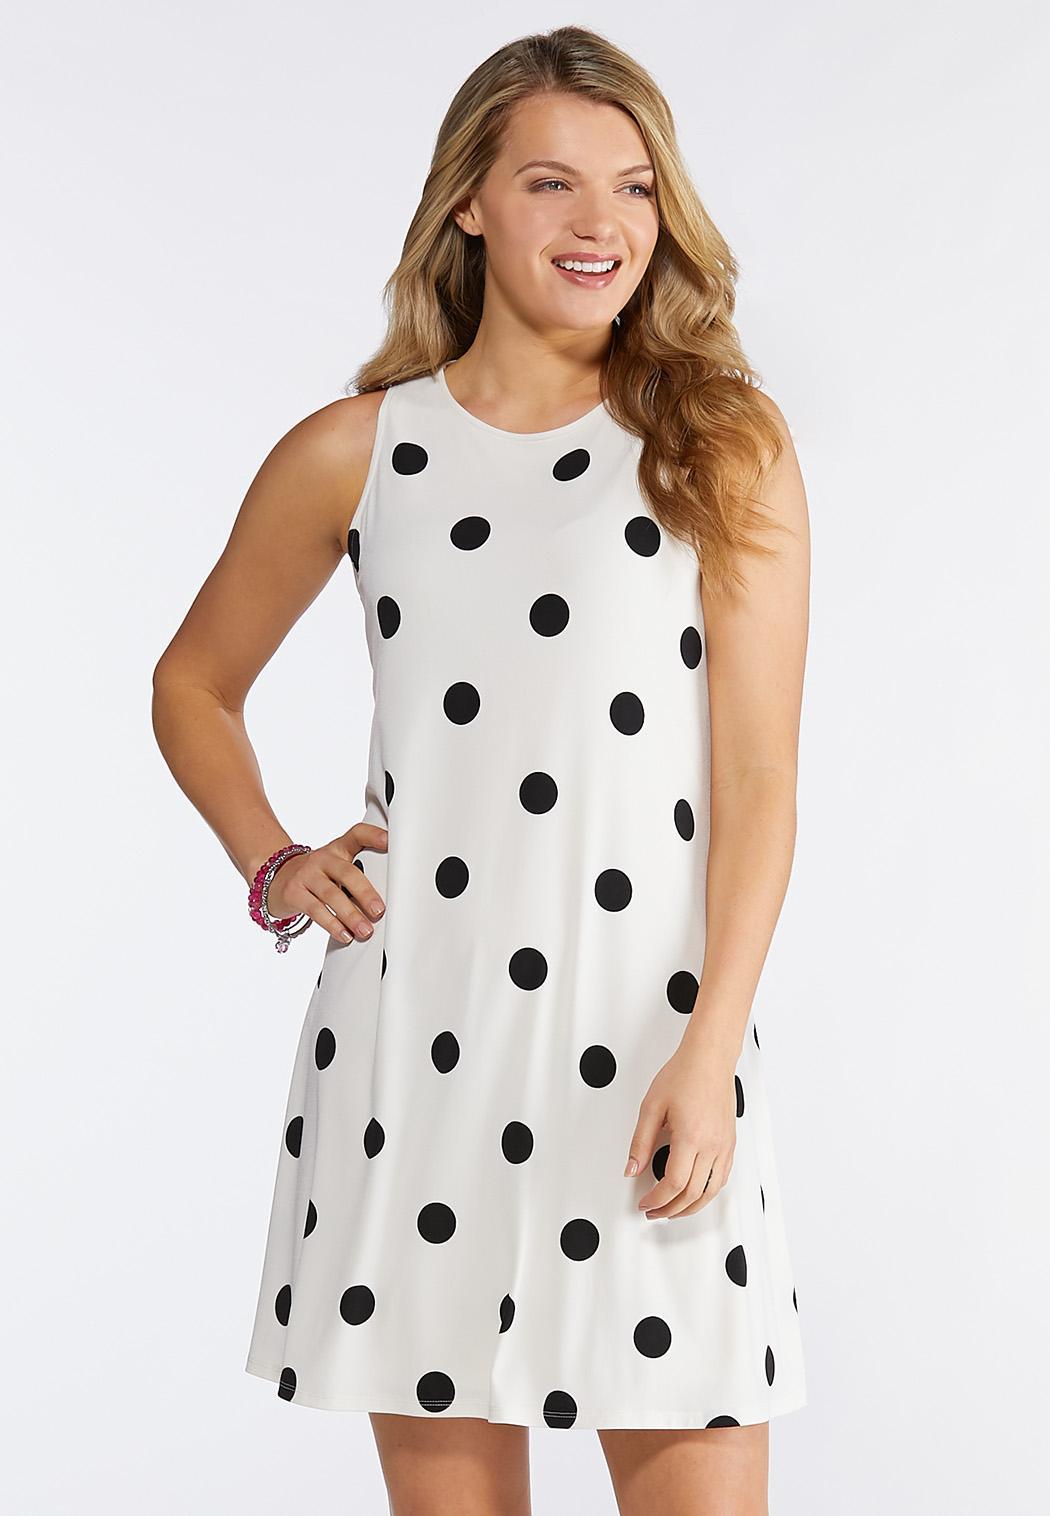 Plus Size Polka Dot Swing Dress A-line & Swing Cato Fashions